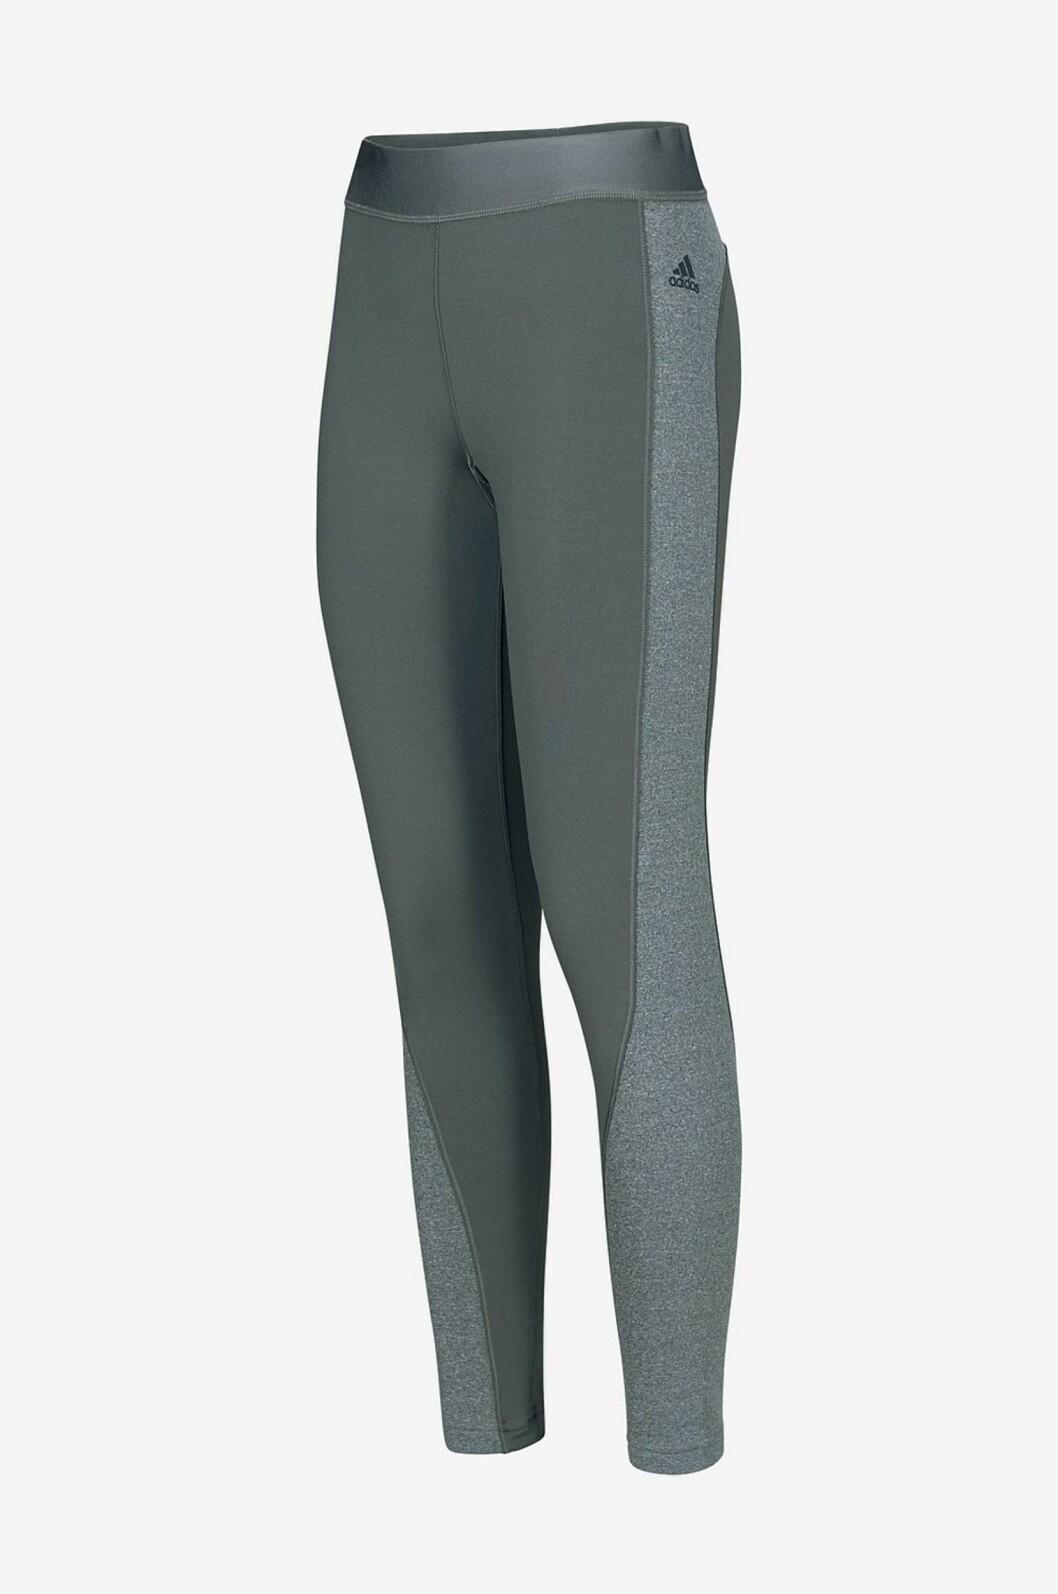 Tights fra Adidas |449,-| https://www.ellos.no/adidas-sport-performance/lopetights-techfit-climawarm-fleece/1506961-01